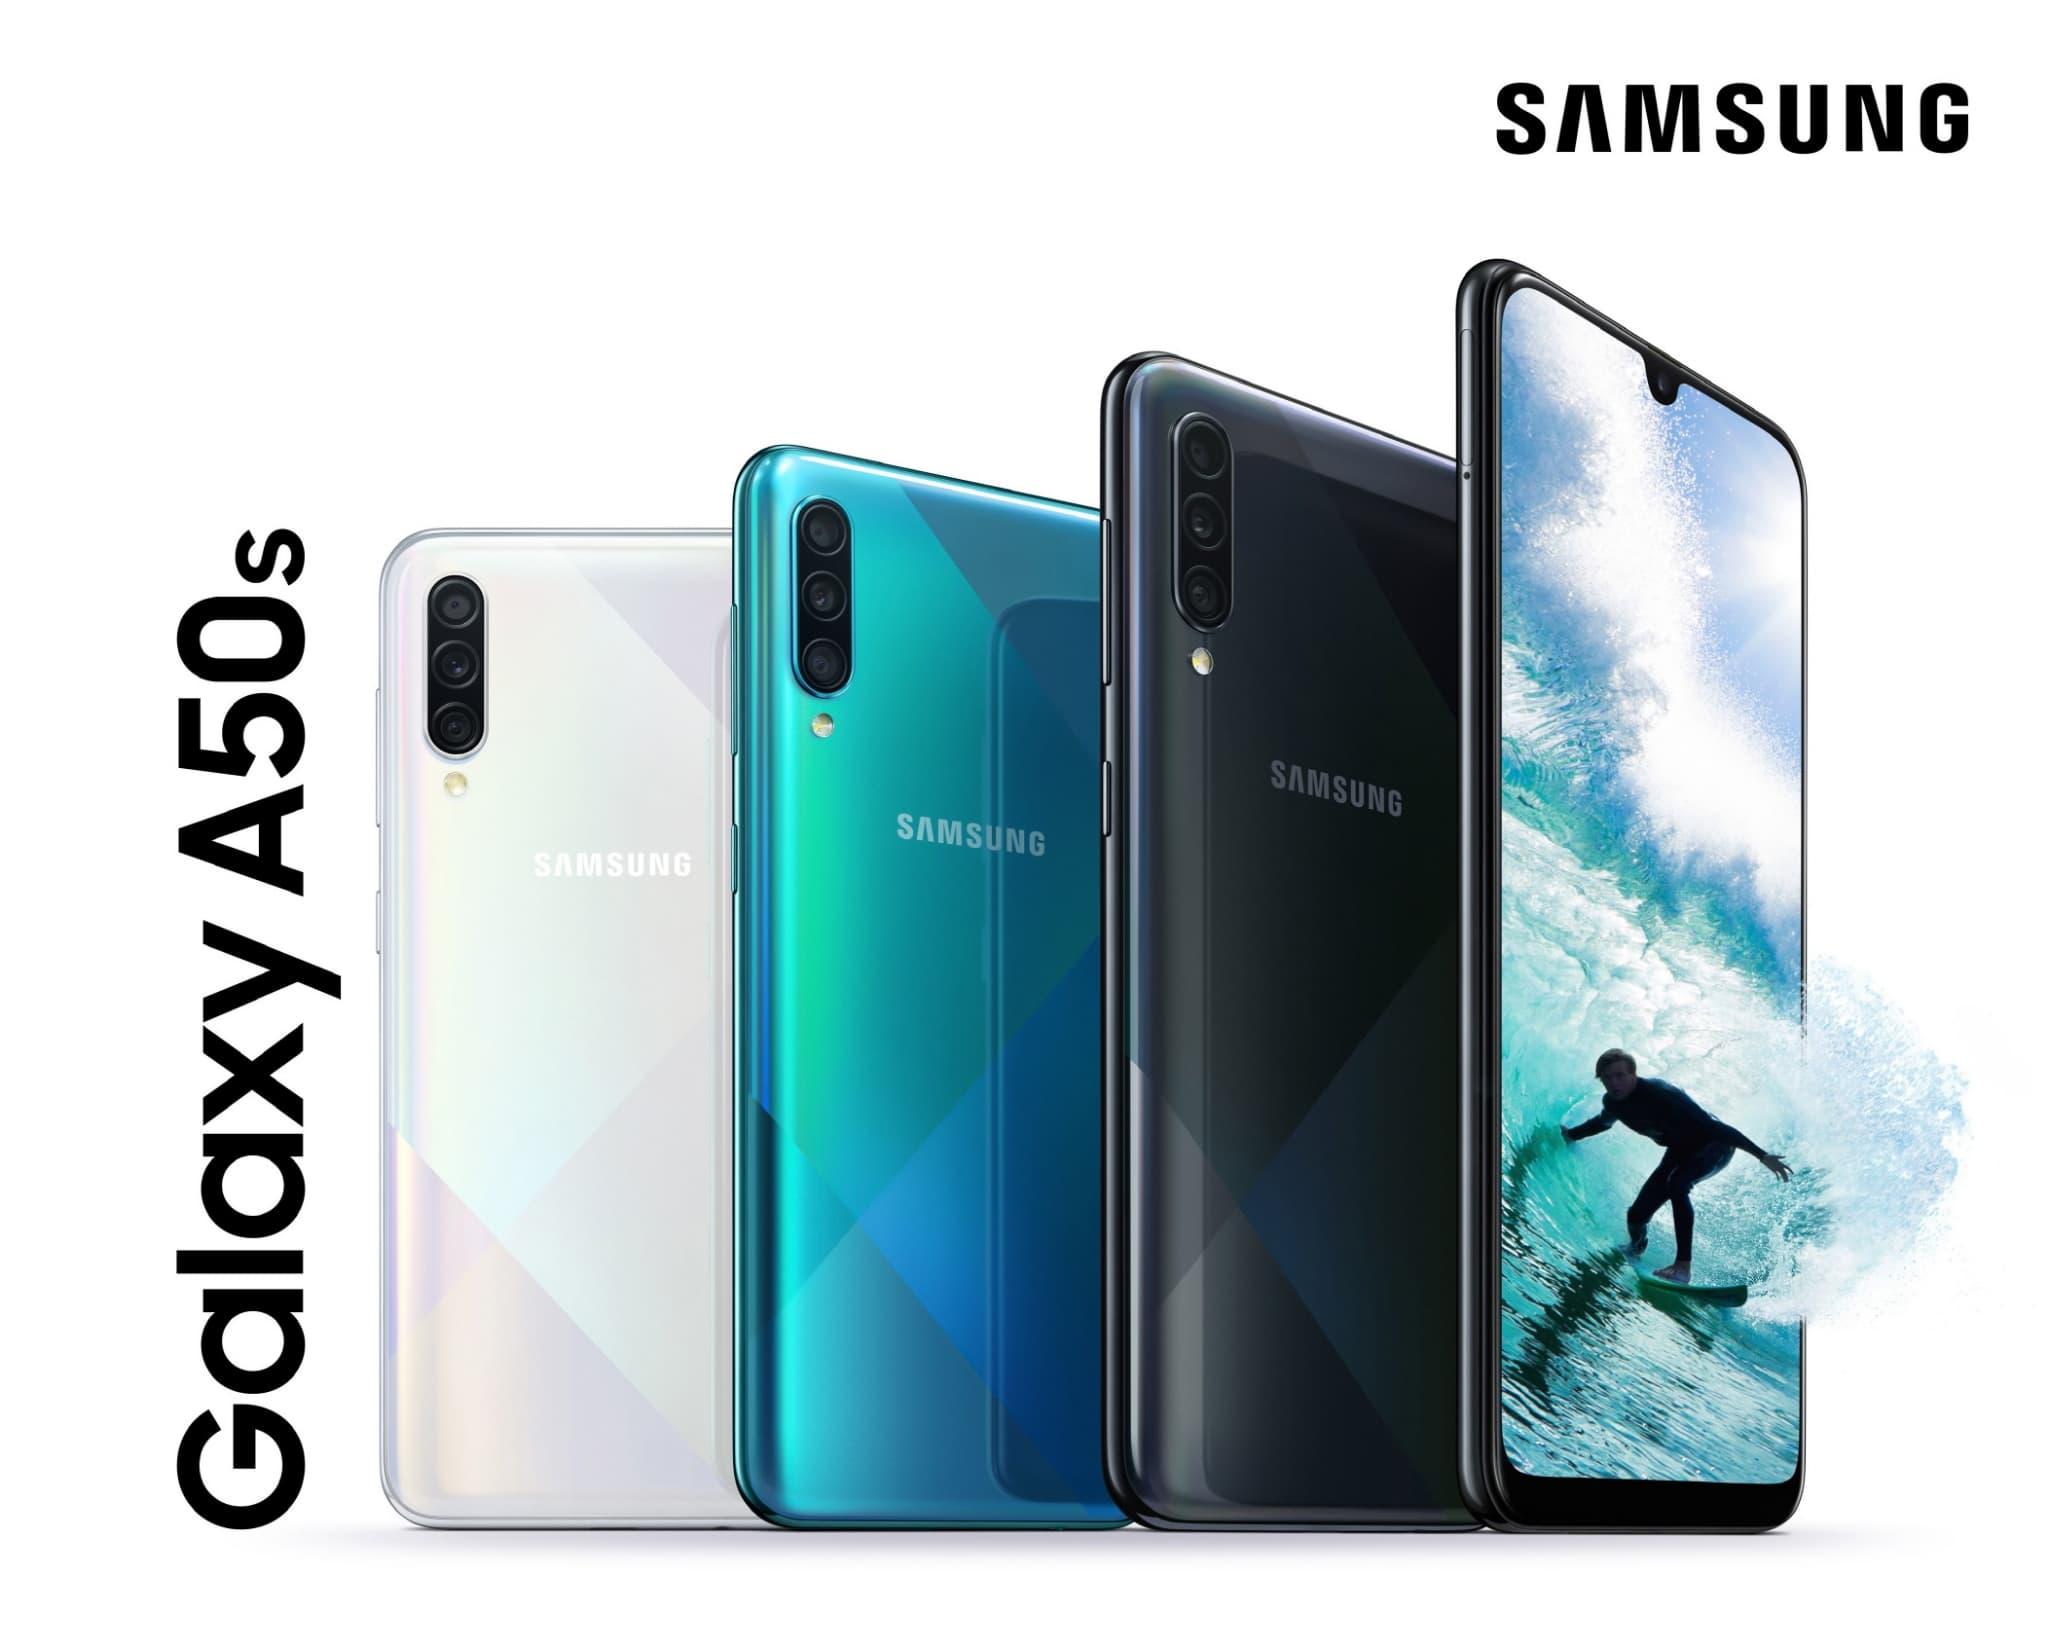 Le Galaxy A50, le smartphone bon marché signé Samsung.